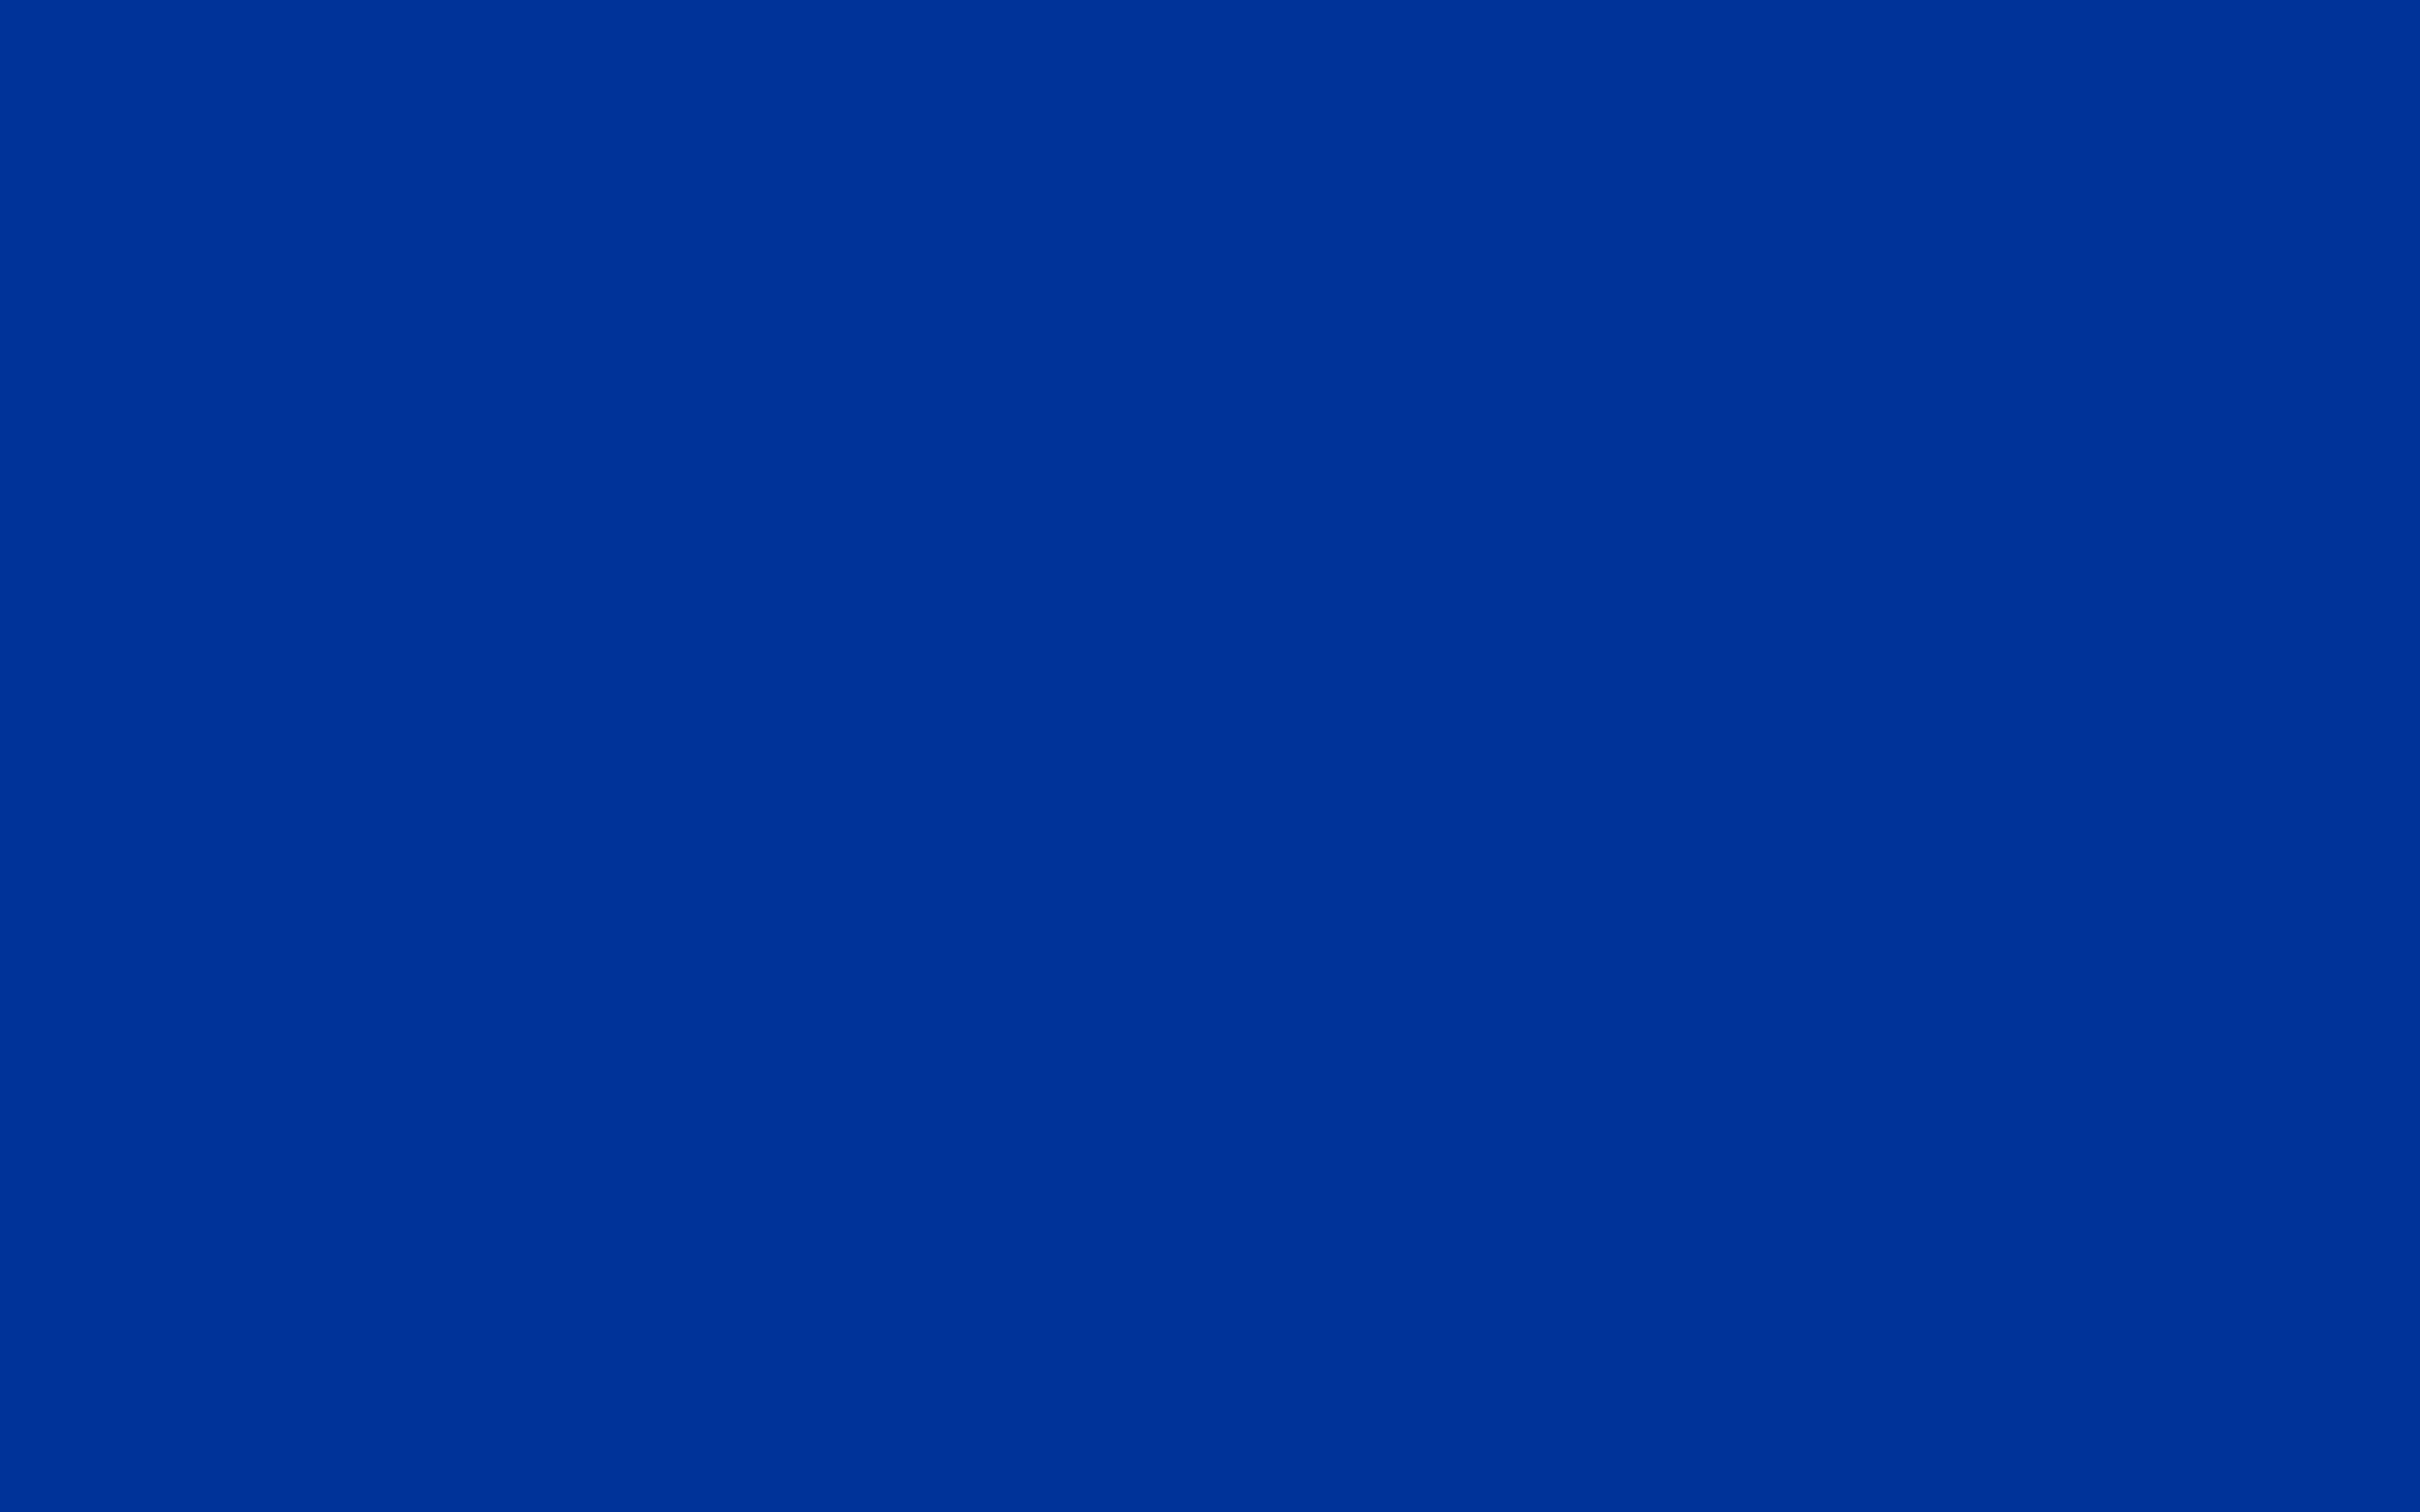 2560x1600 Smalt Dark Powder Blue Solid Color Background